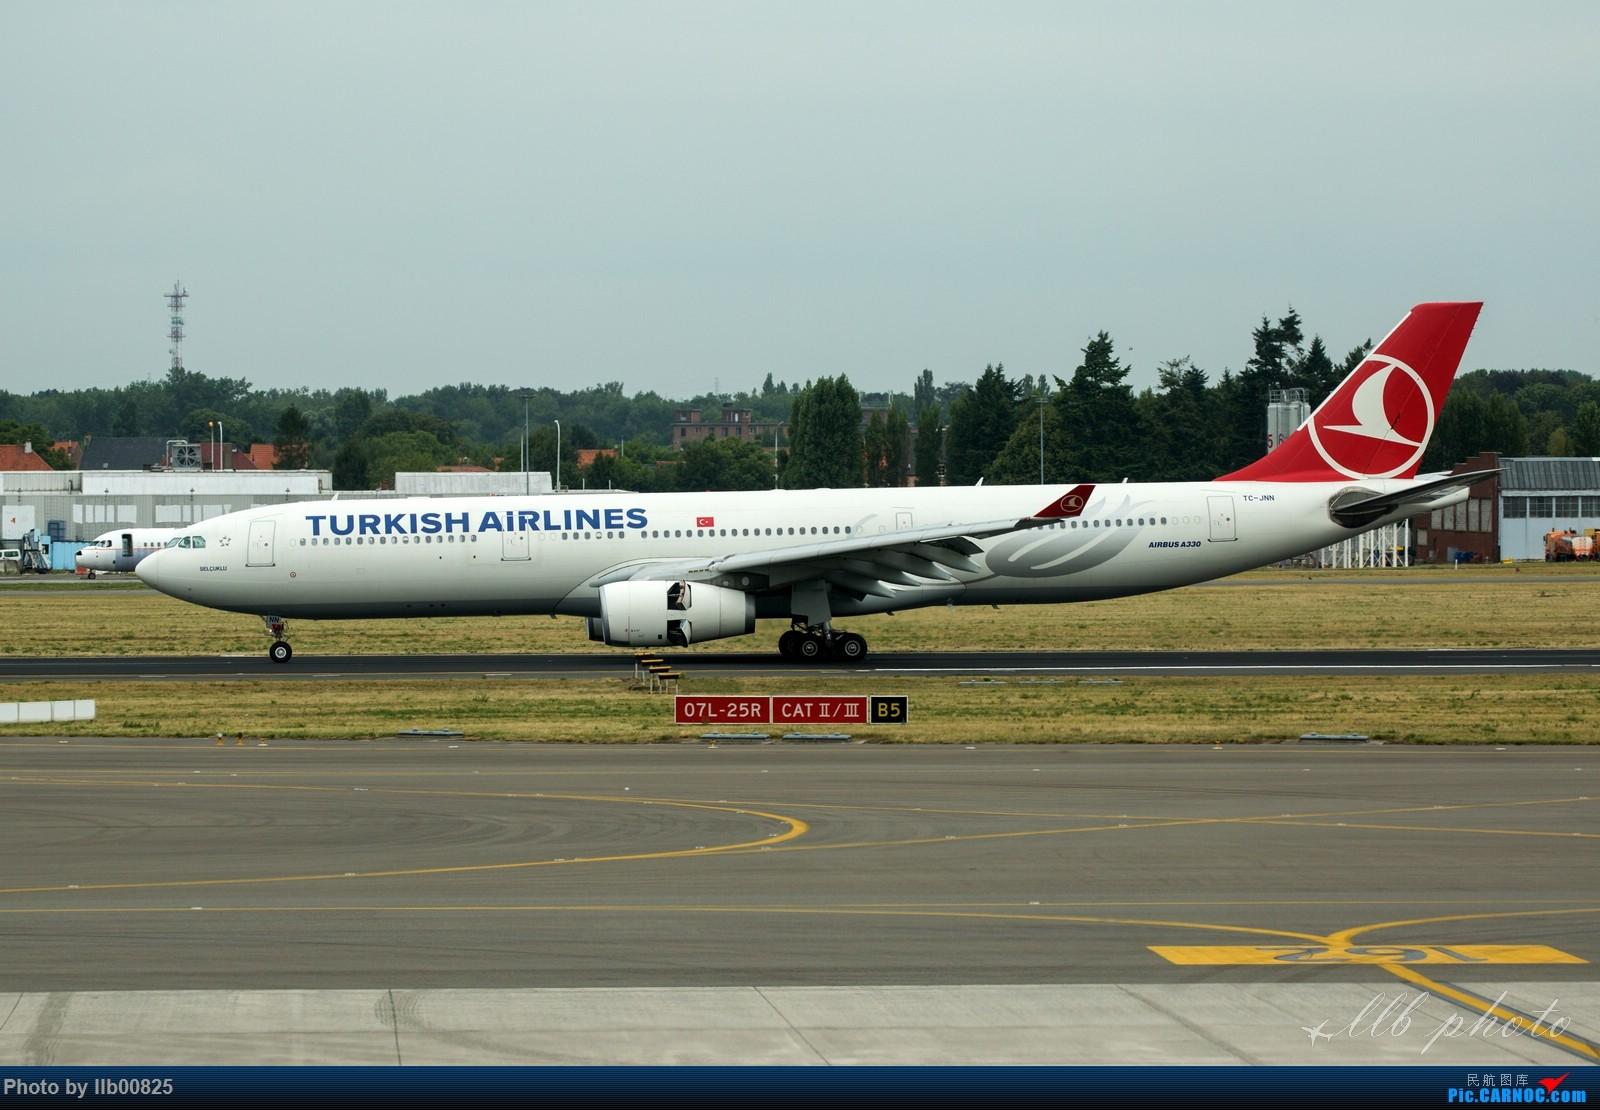 Re:[原创]赫尔辛基-布鲁塞尔一些杂图 AIRBUS A330-200 TC-JNN 比利时布鲁塞尔机场